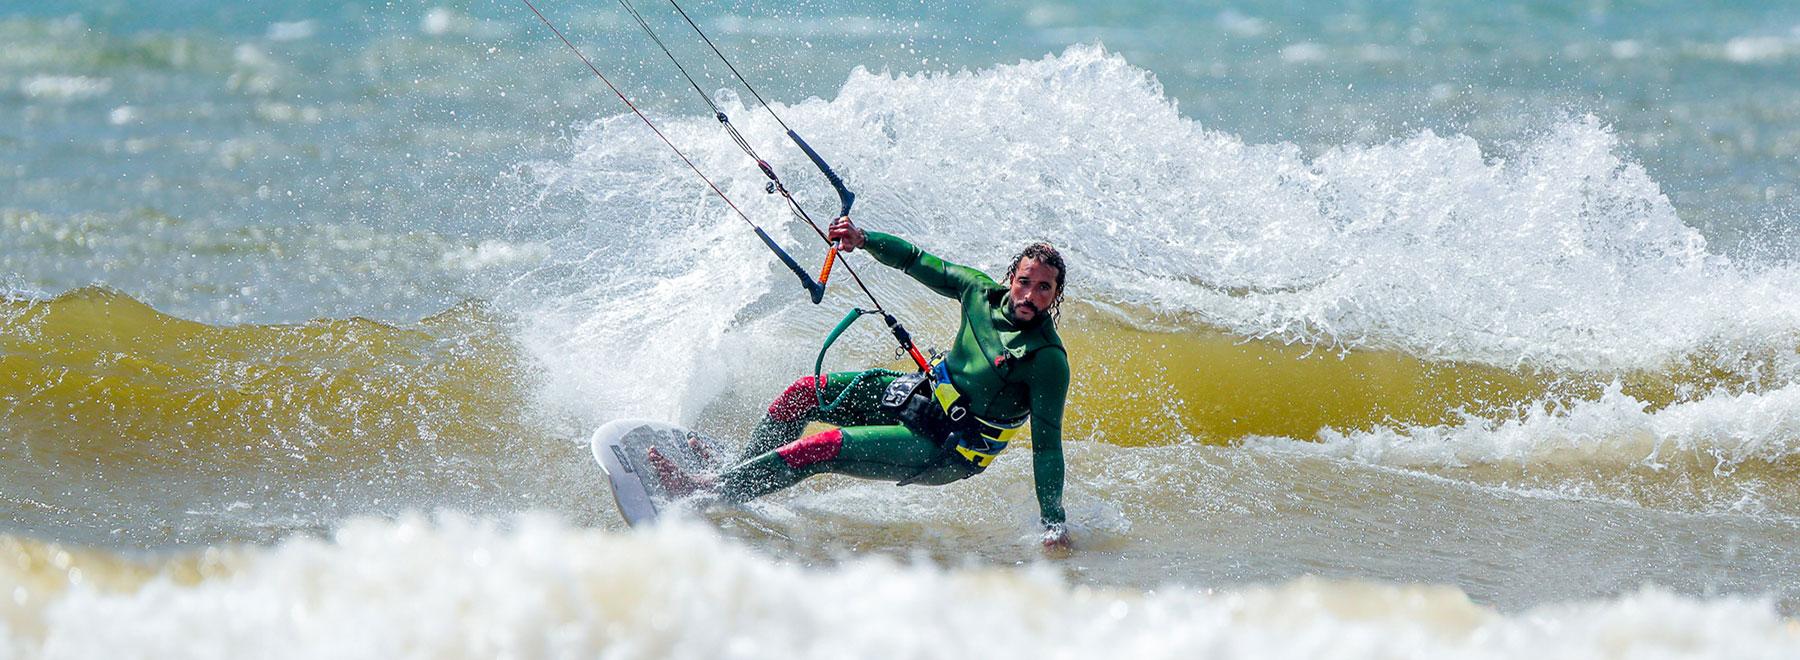 Kitesurfen in Essaouira_Wavekiten